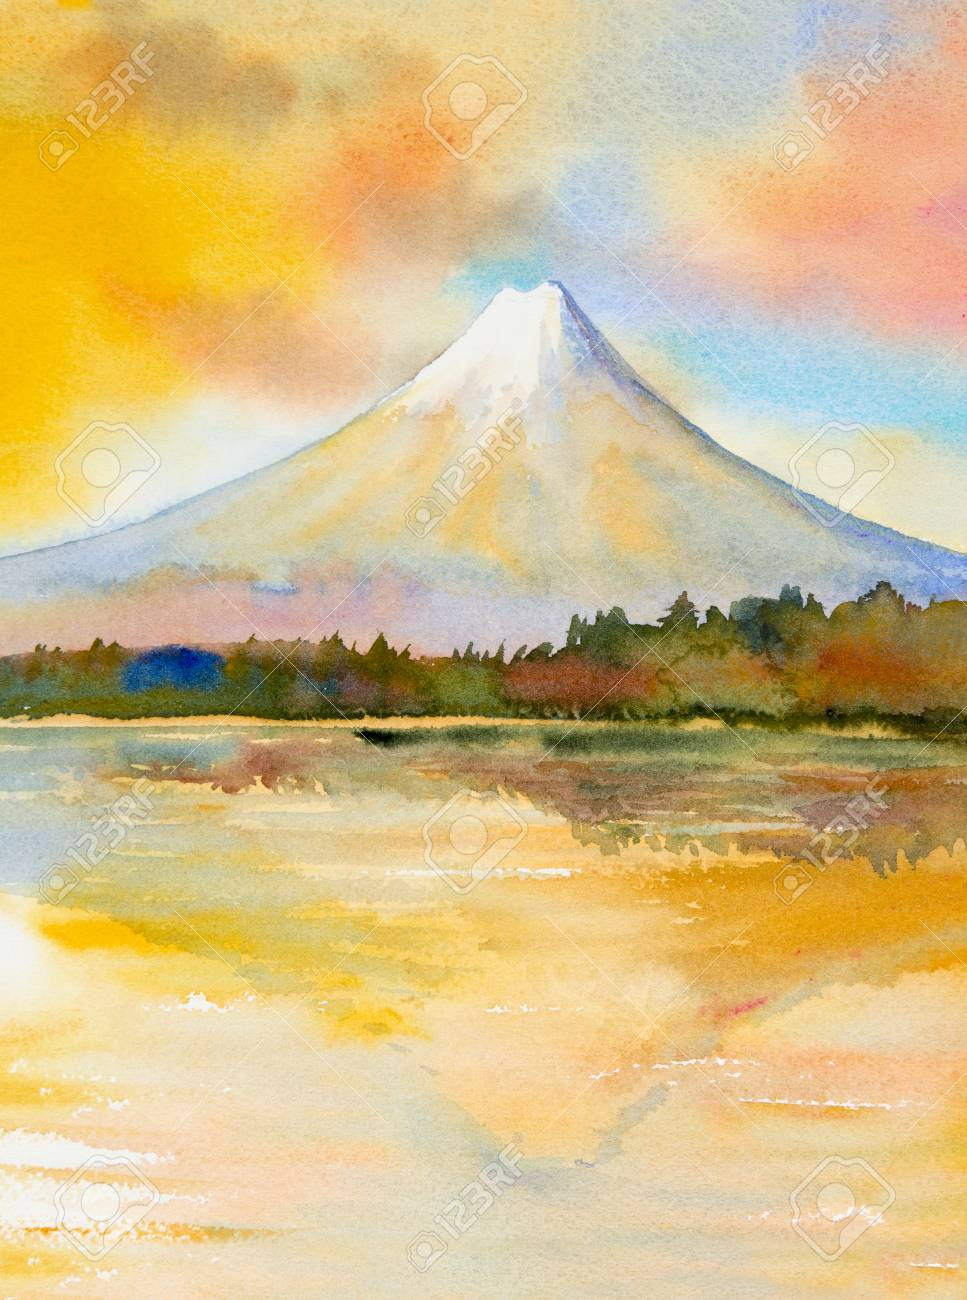 Mount Fuji Lake Kawaguchiko Famous Landmark Of Japan Watercolor Stock Photo Picture And Royalty Free Image Image 101699292